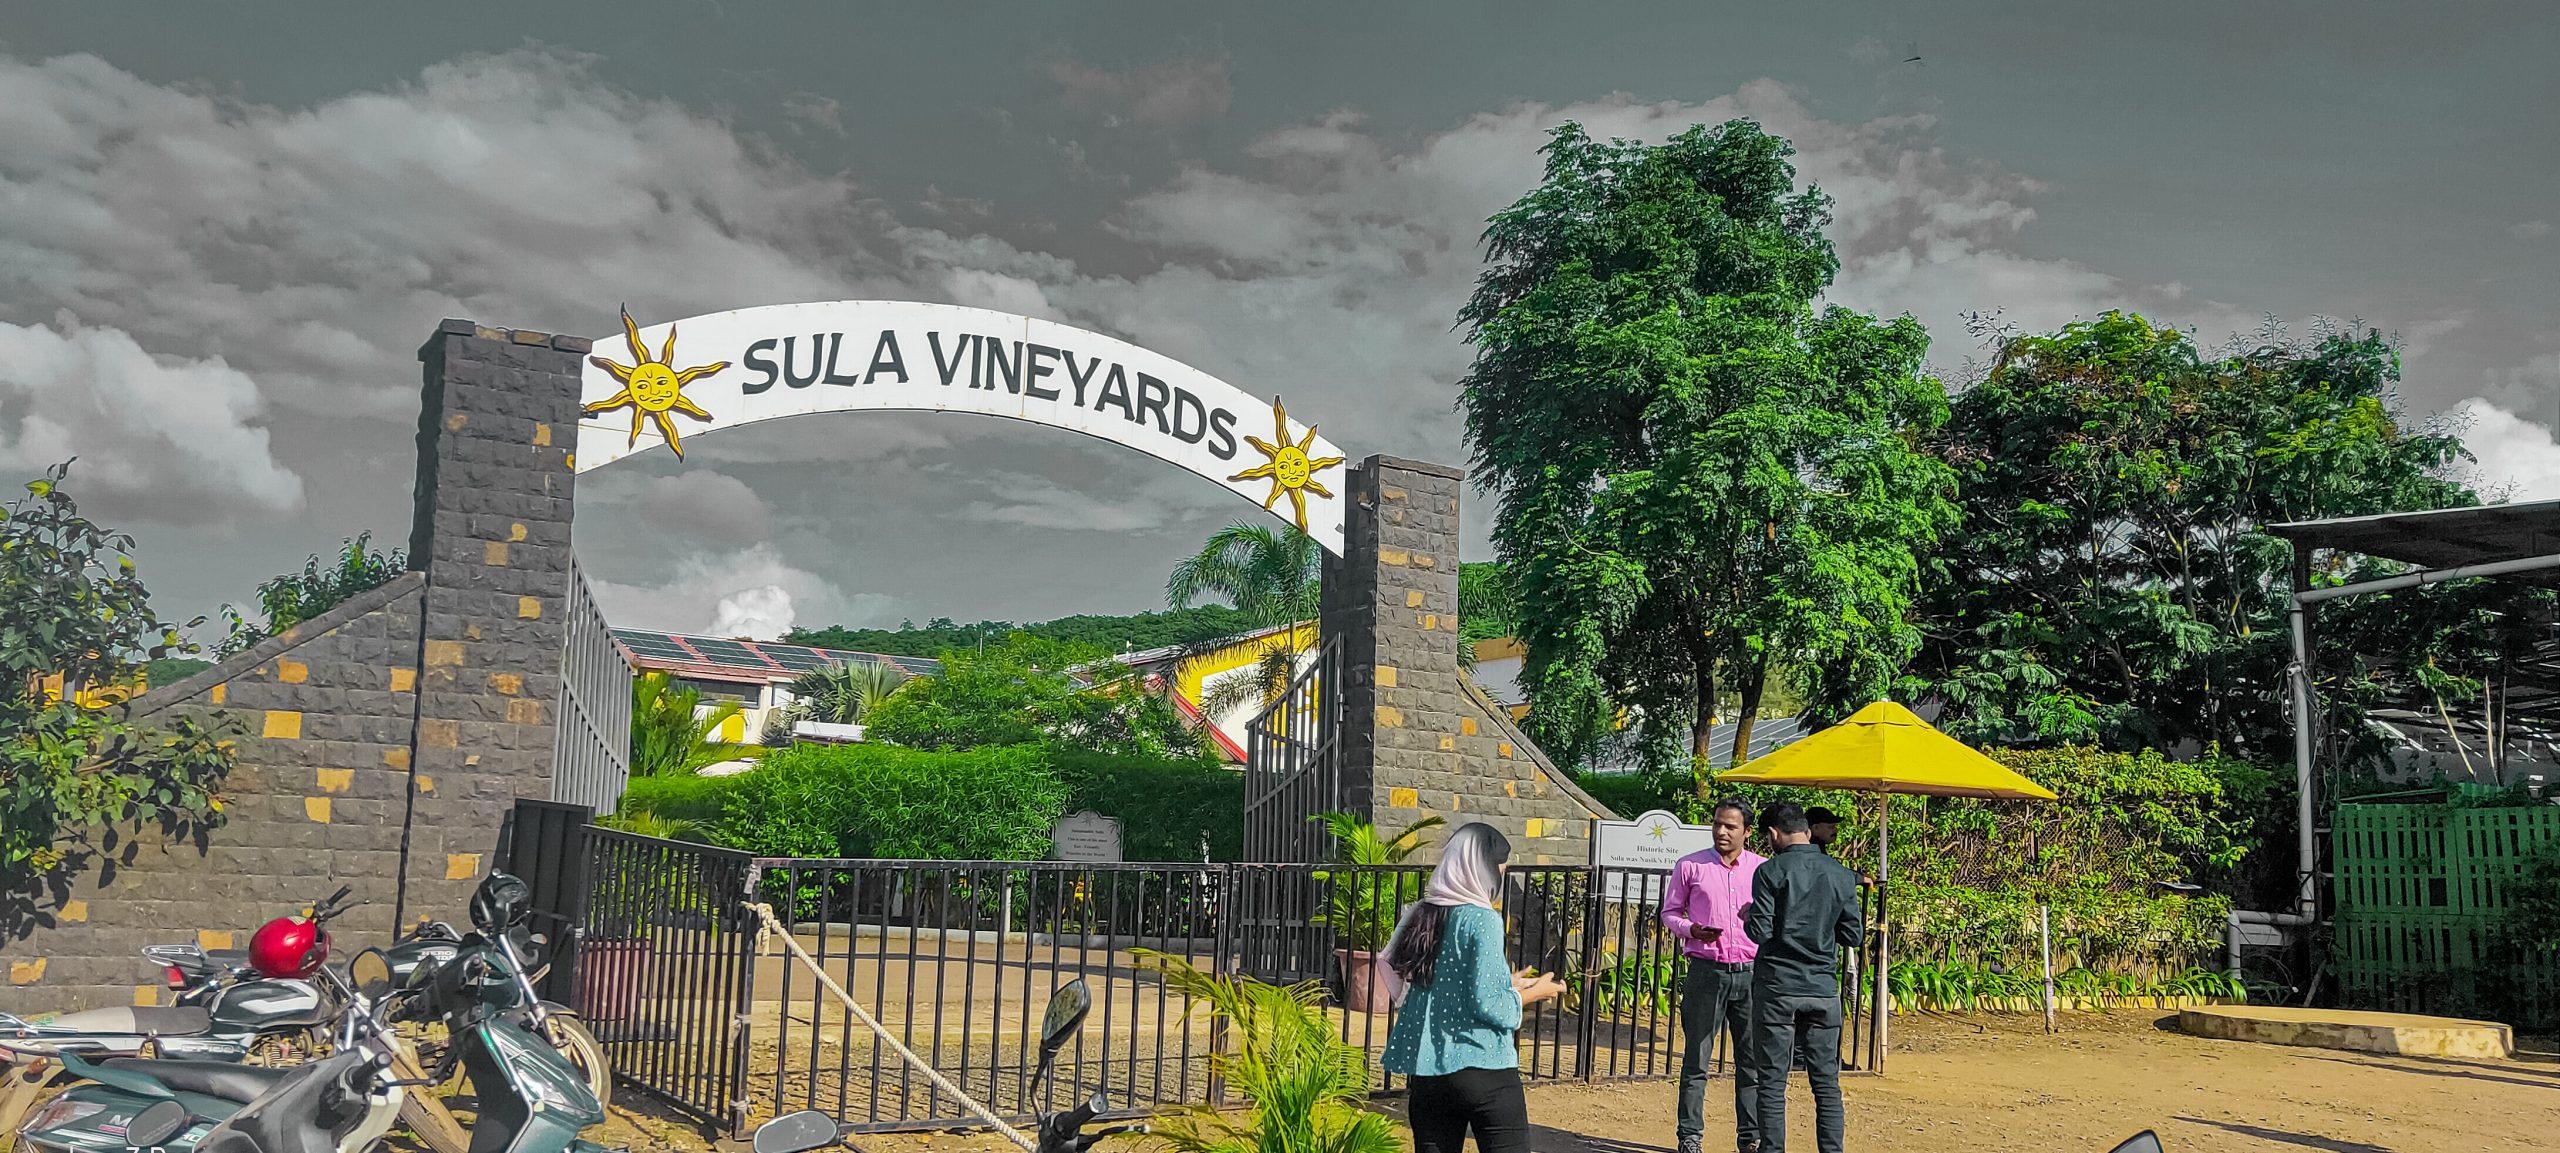 Entrance gate of Sula Vineyards in Nashik